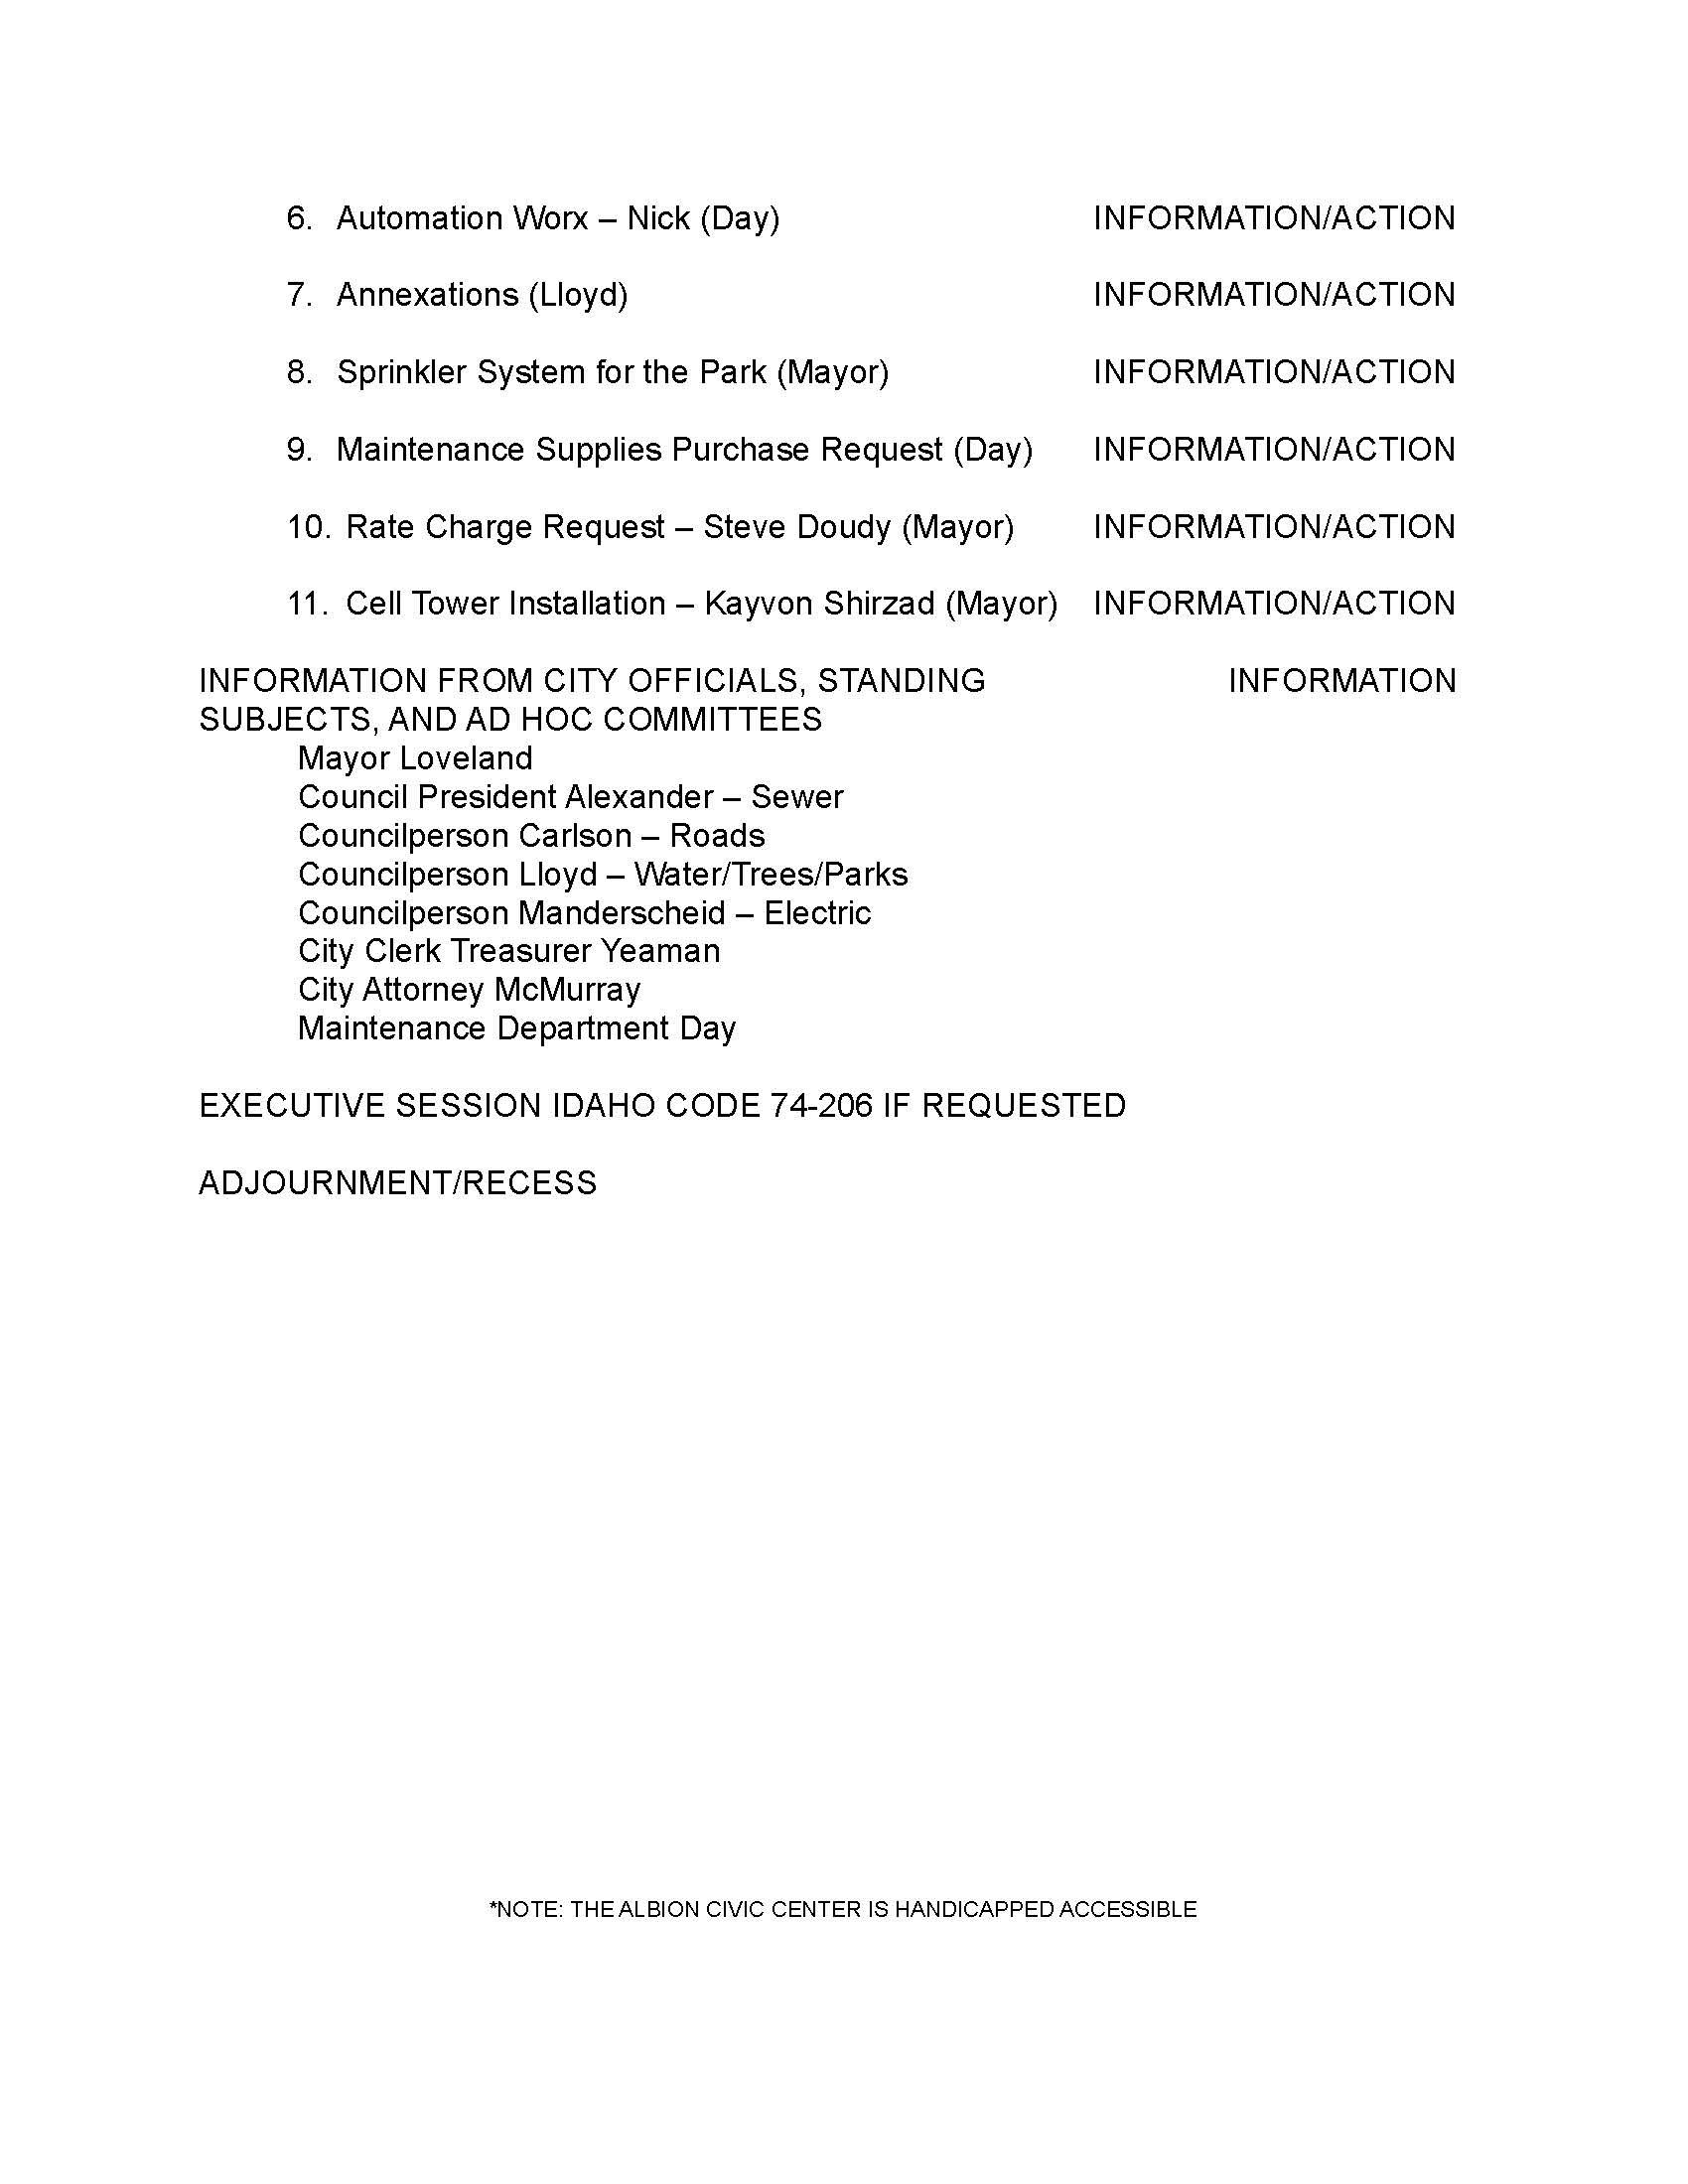 Agenda 09.03_Page_2.jpg